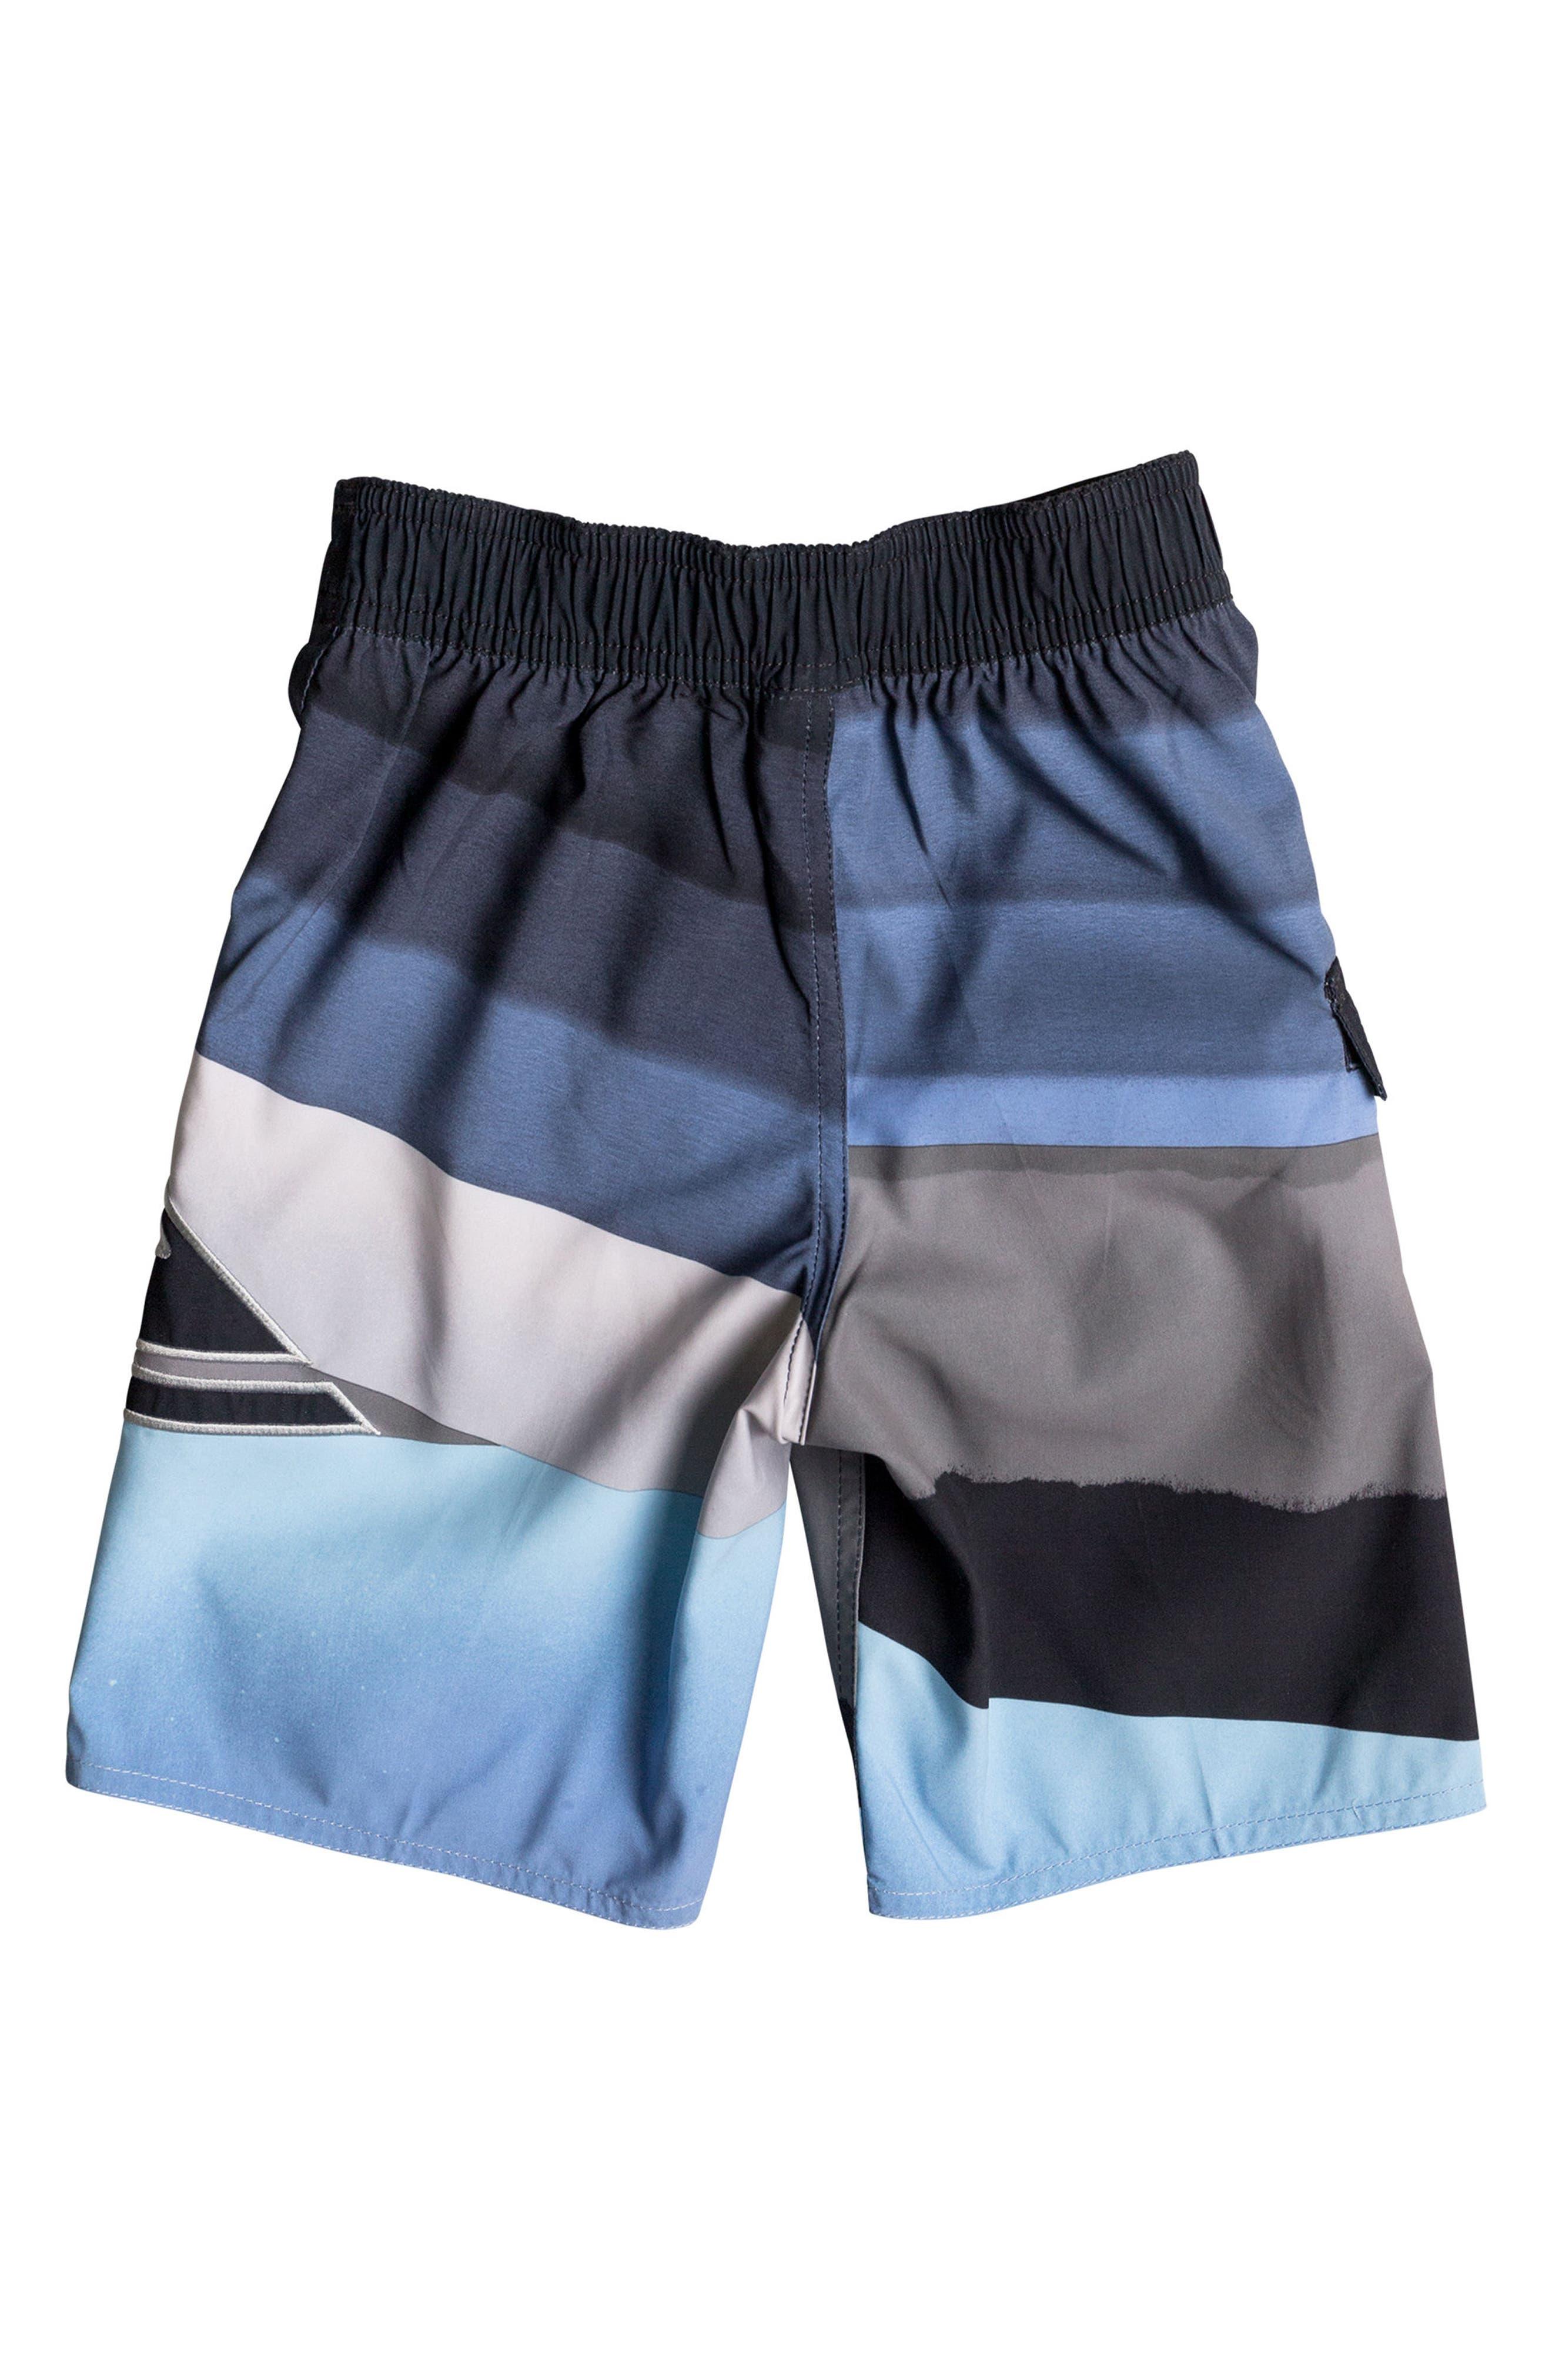 Slash Board Shorts,                             Alternate thumbnail 2, color,                             Regatta